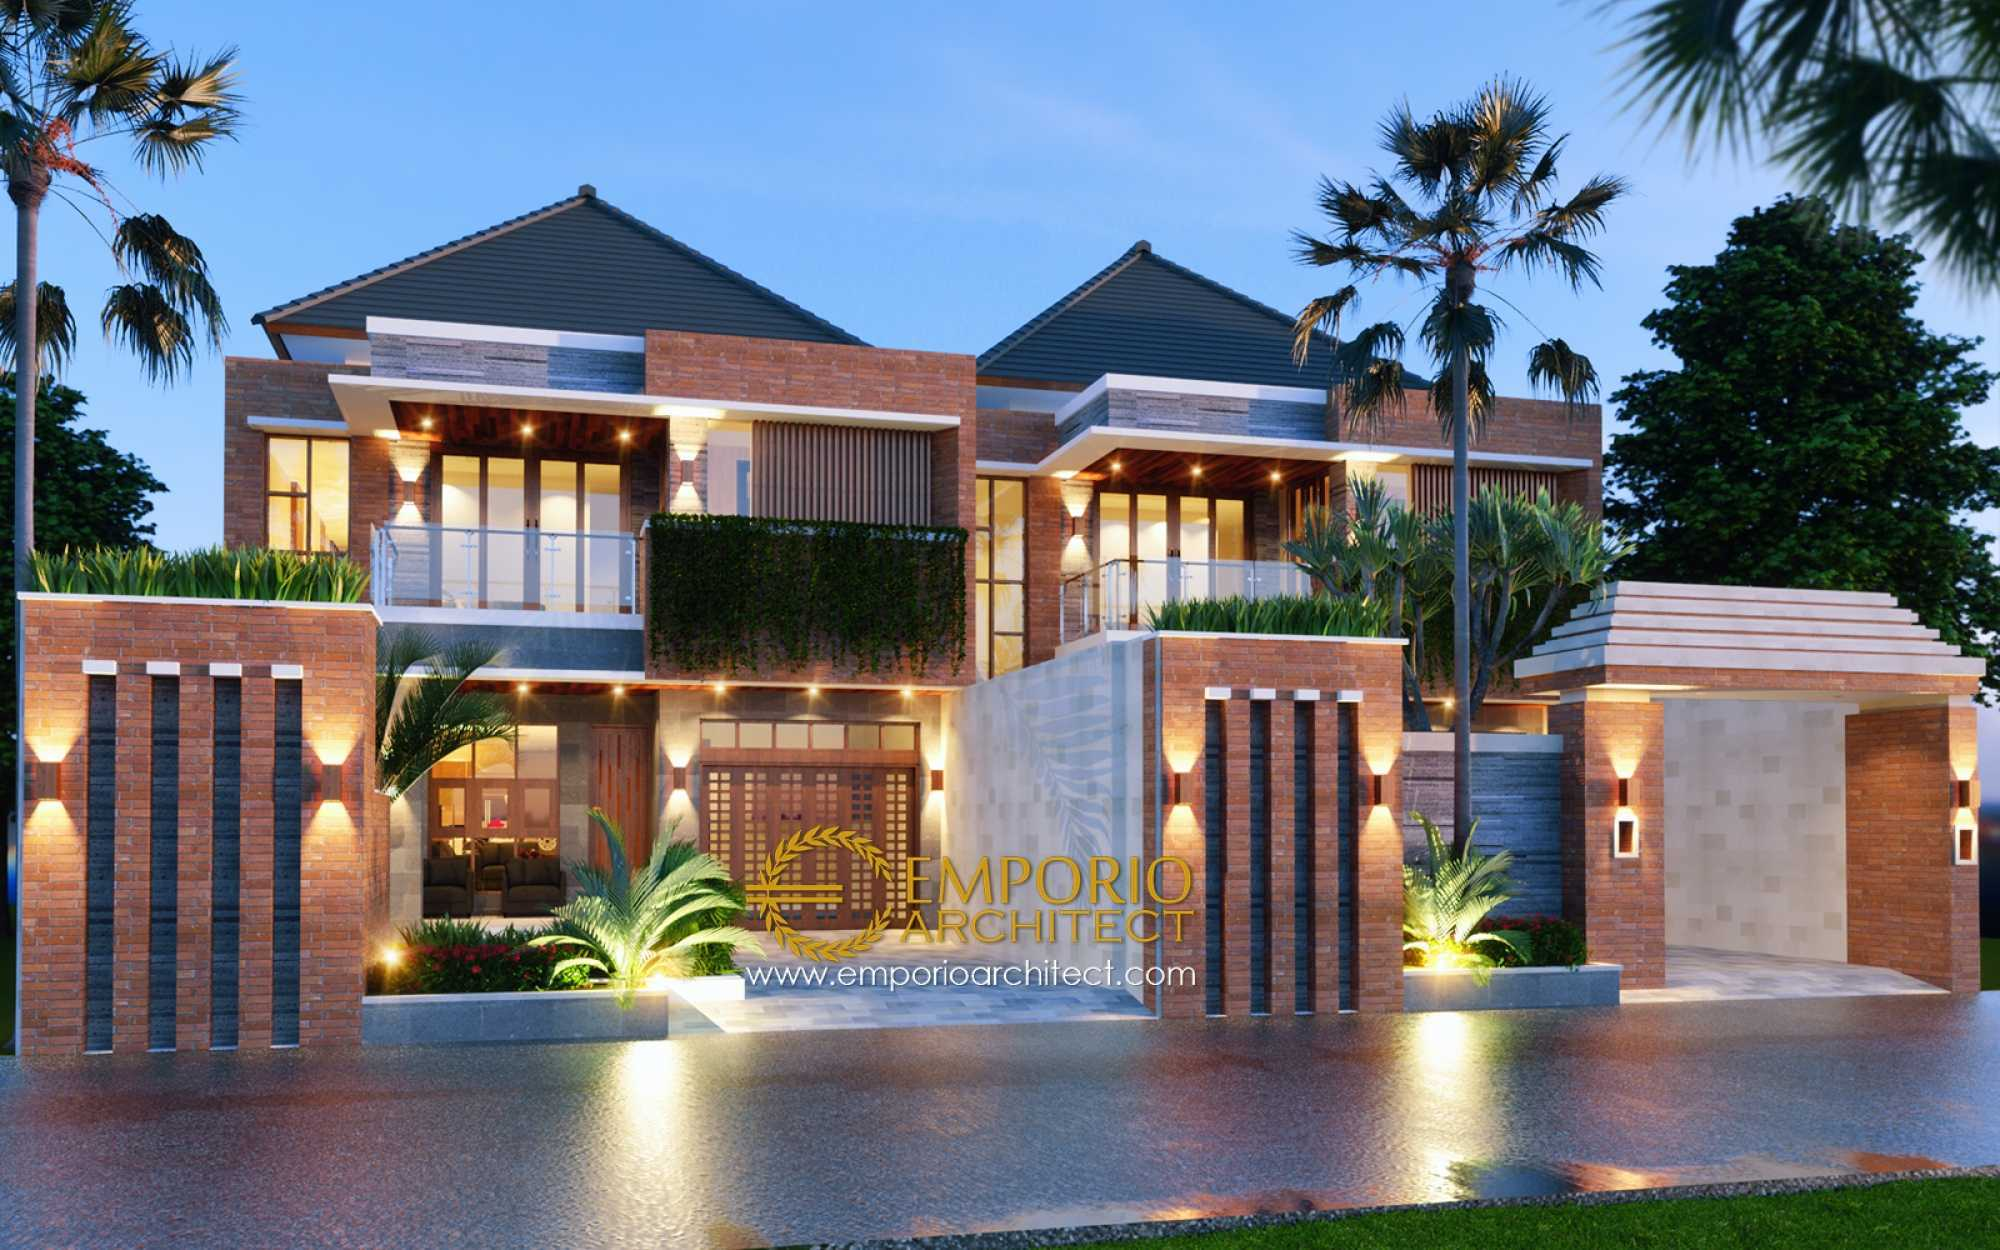 Emporio Architect Desain Rumah Villa Bali Tropis 375 @ Denpasar, Bali Kota Denpasar, Bali, Indonesia Kota Denpasar, Bali, Indonesia Emporio-Architect-Desain-Rumah-Villa-Bali-Tropis-375-Denpasar-Bali Tropical 76210